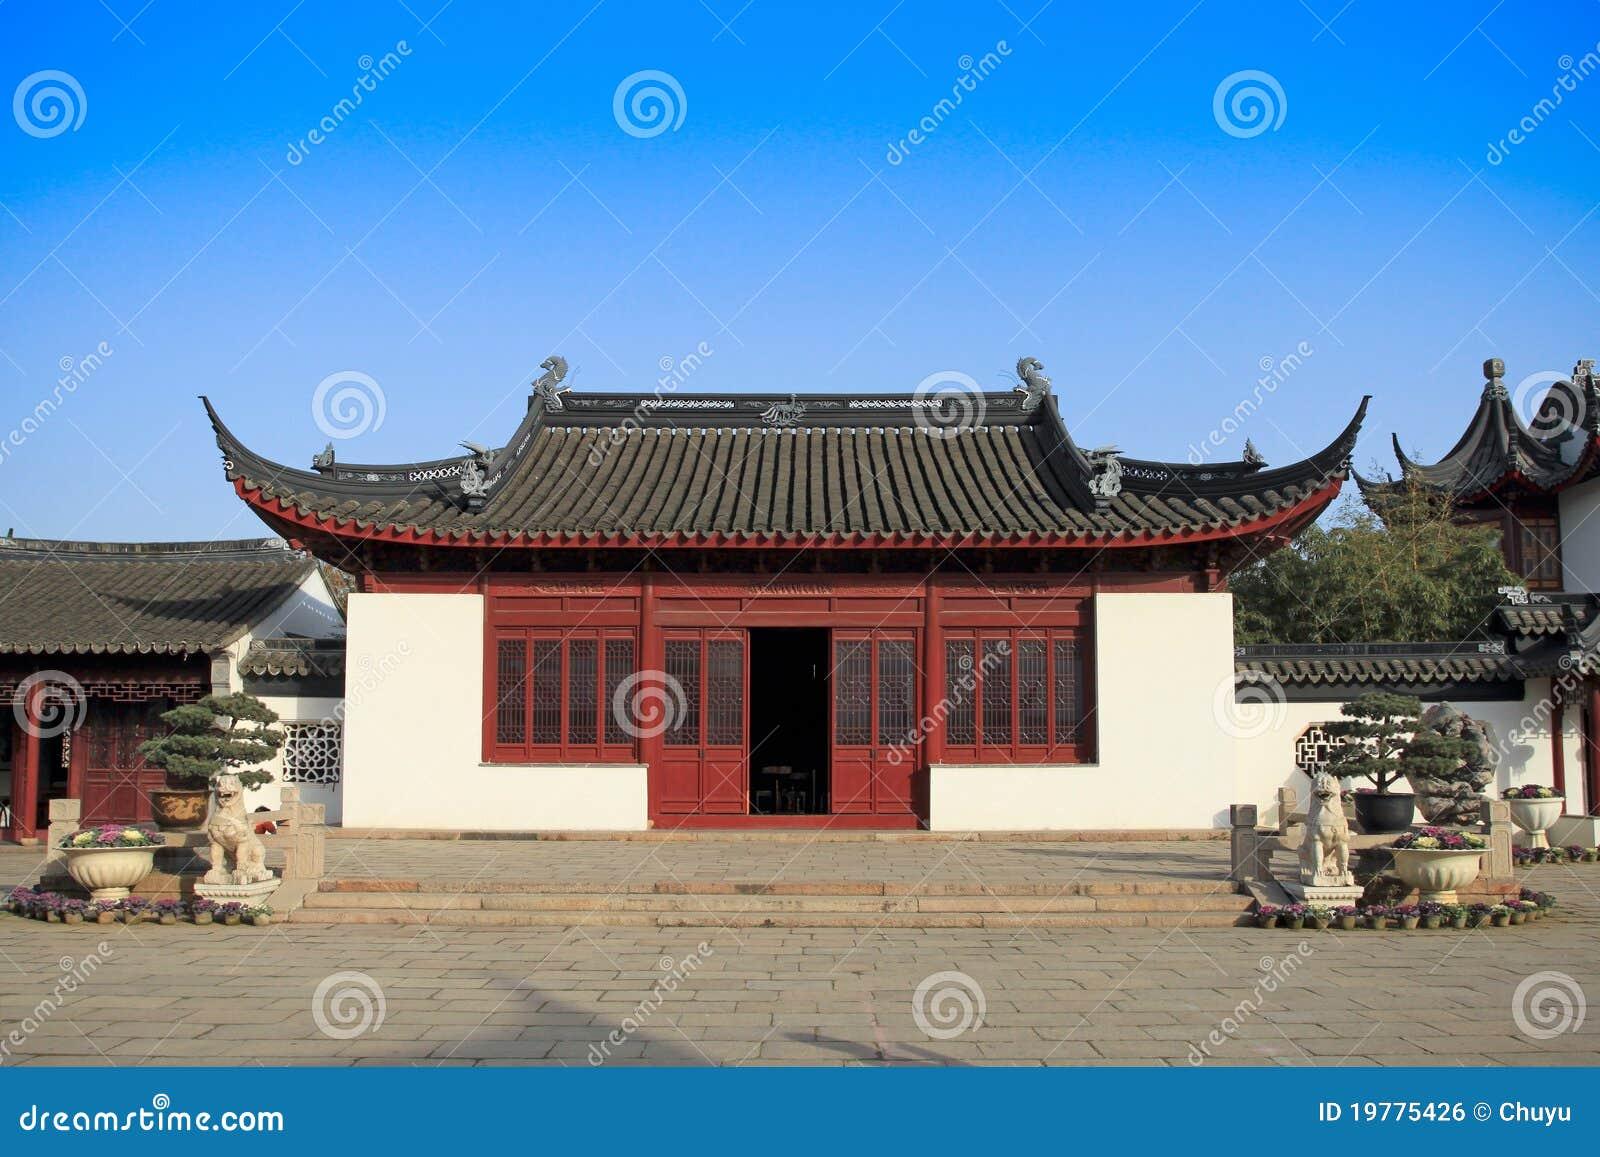 Maison Traditionnelle Chinoise Photo Stock Image Du Asie Tourisme 19775426